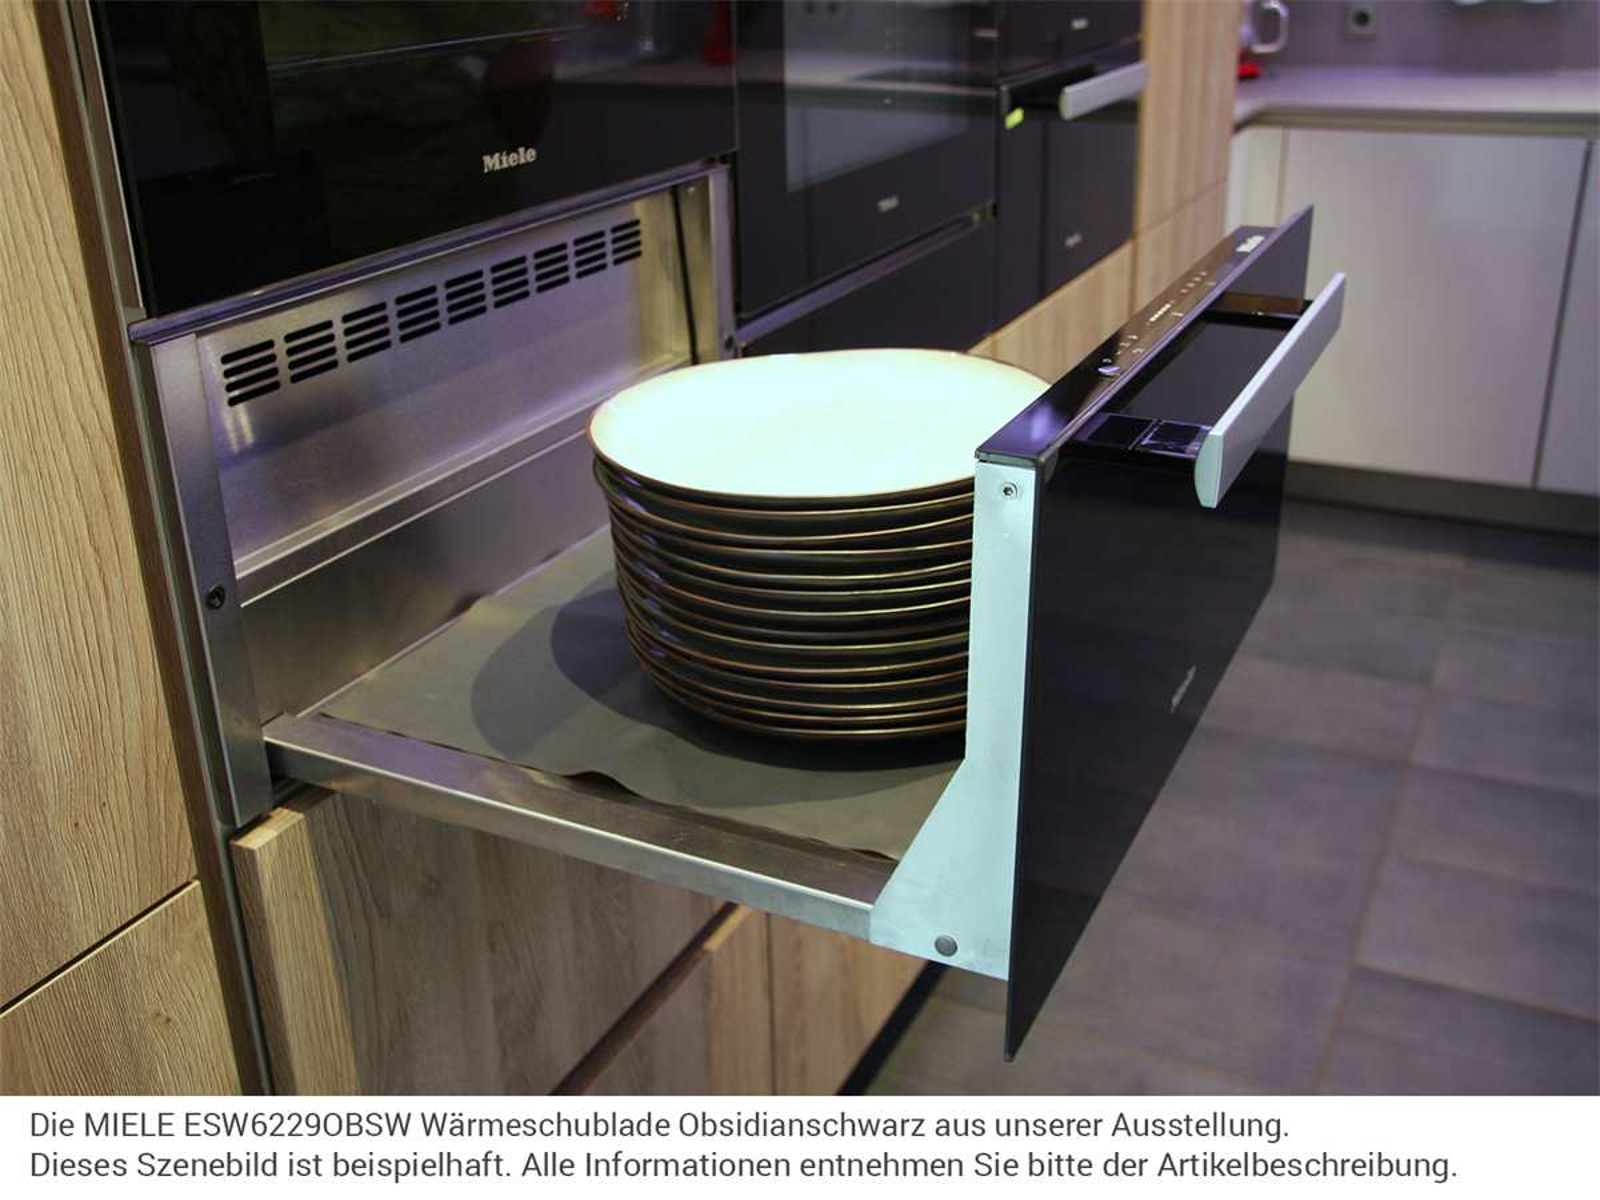 MIELE ESW6229OBSW Wärmeschublade Obsidianschwarz - Ausstellungsstück